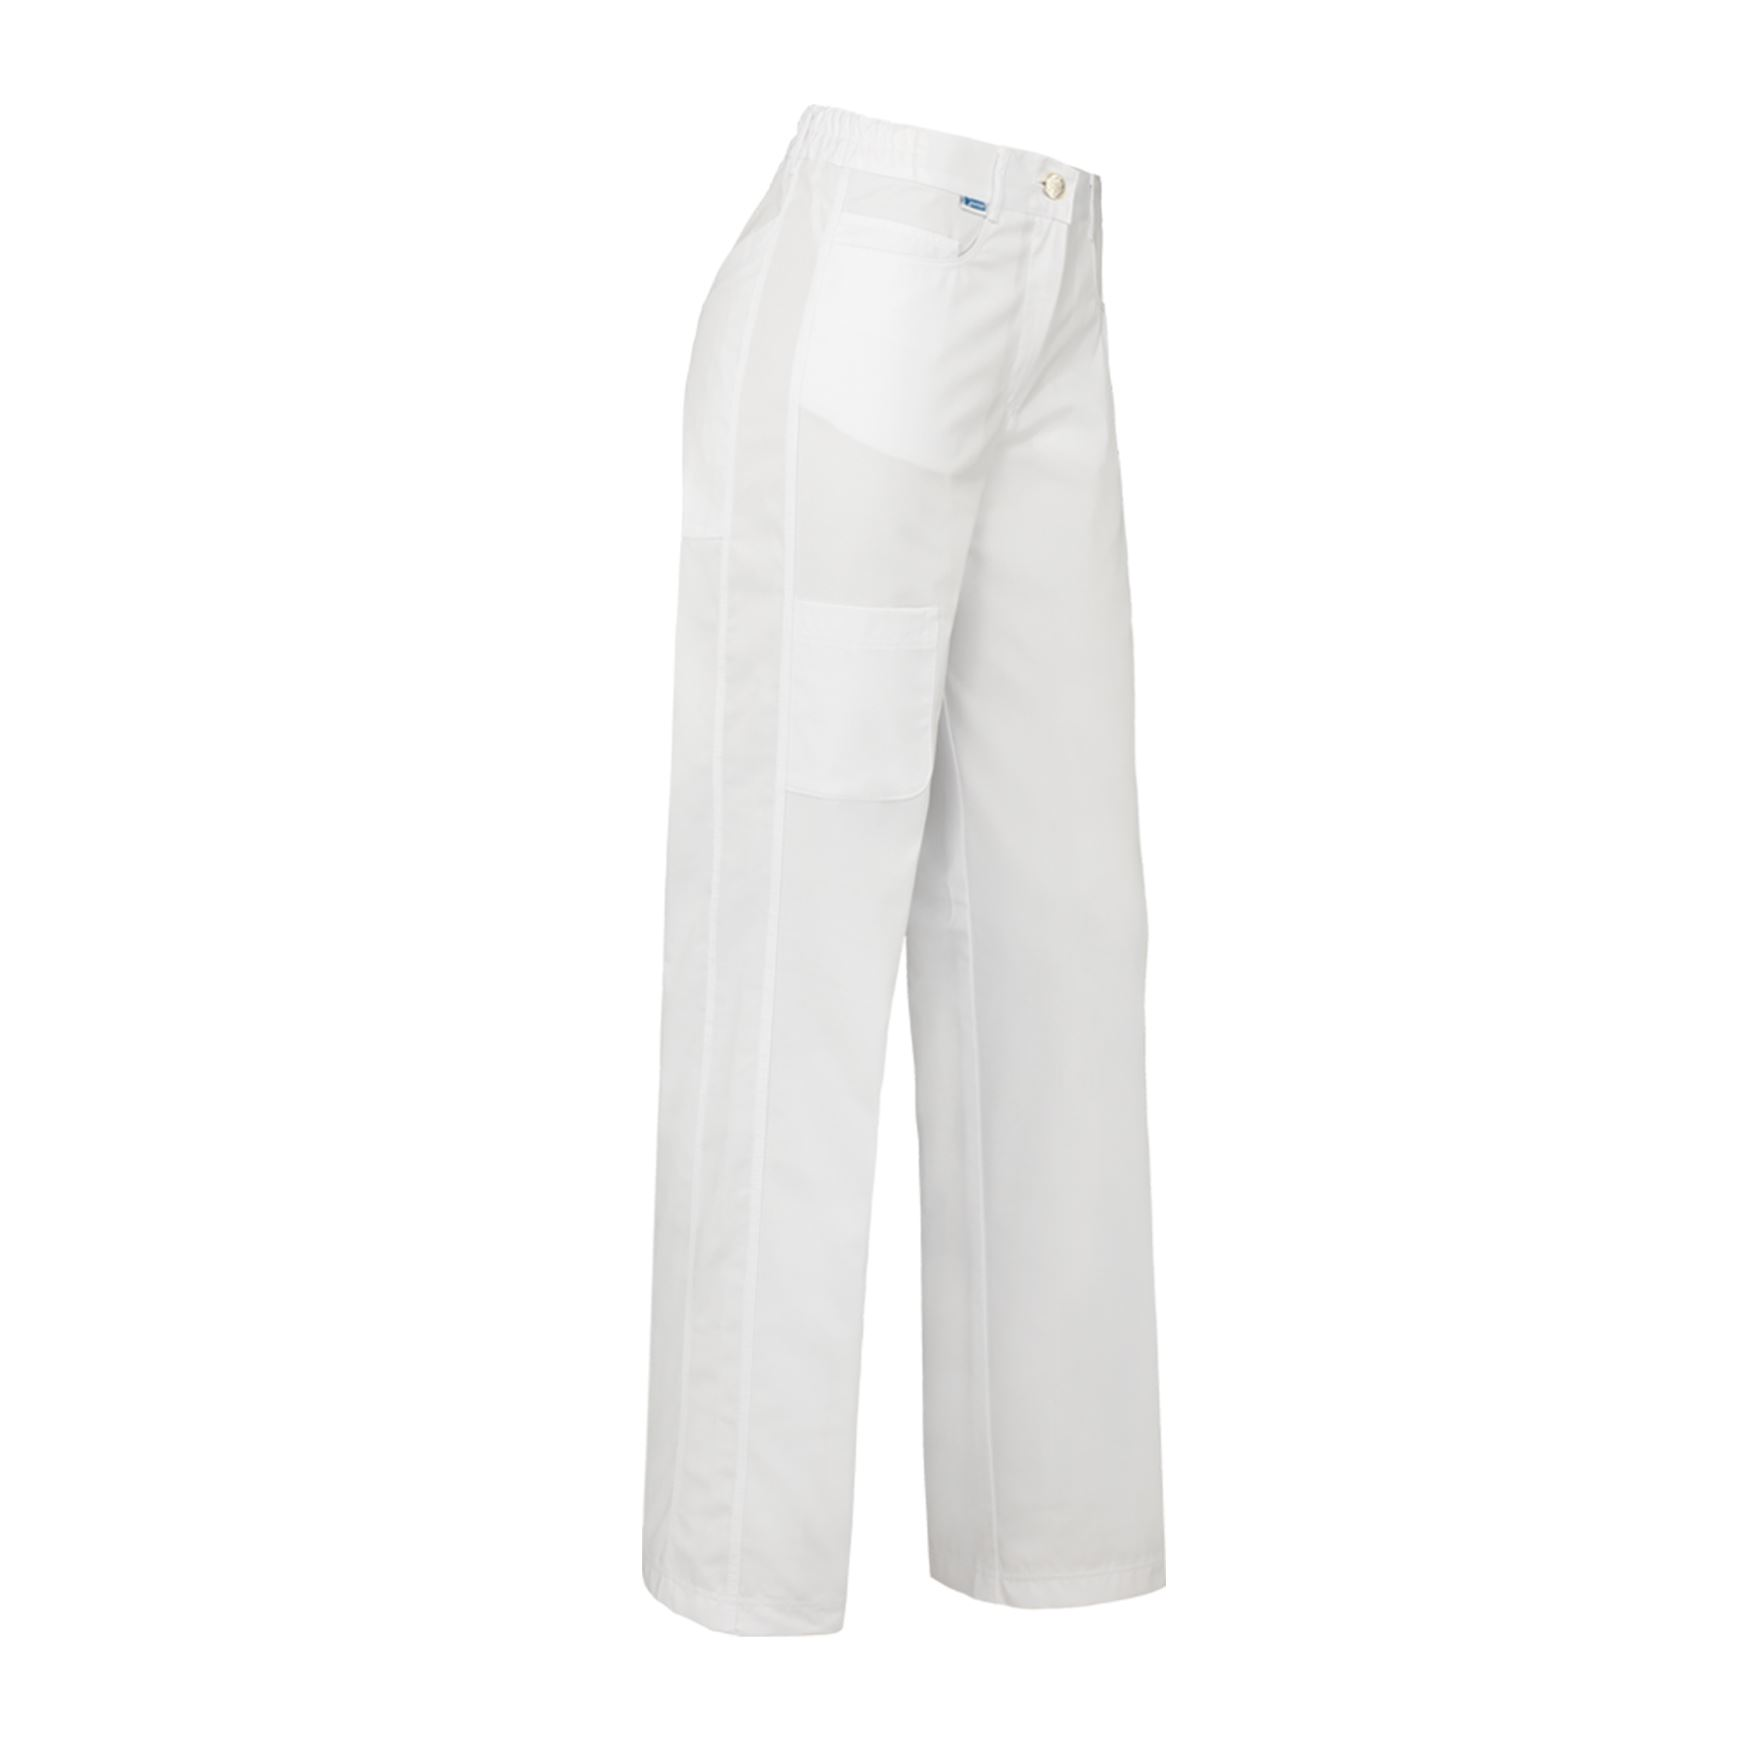 De Berkel Pantalon Milly